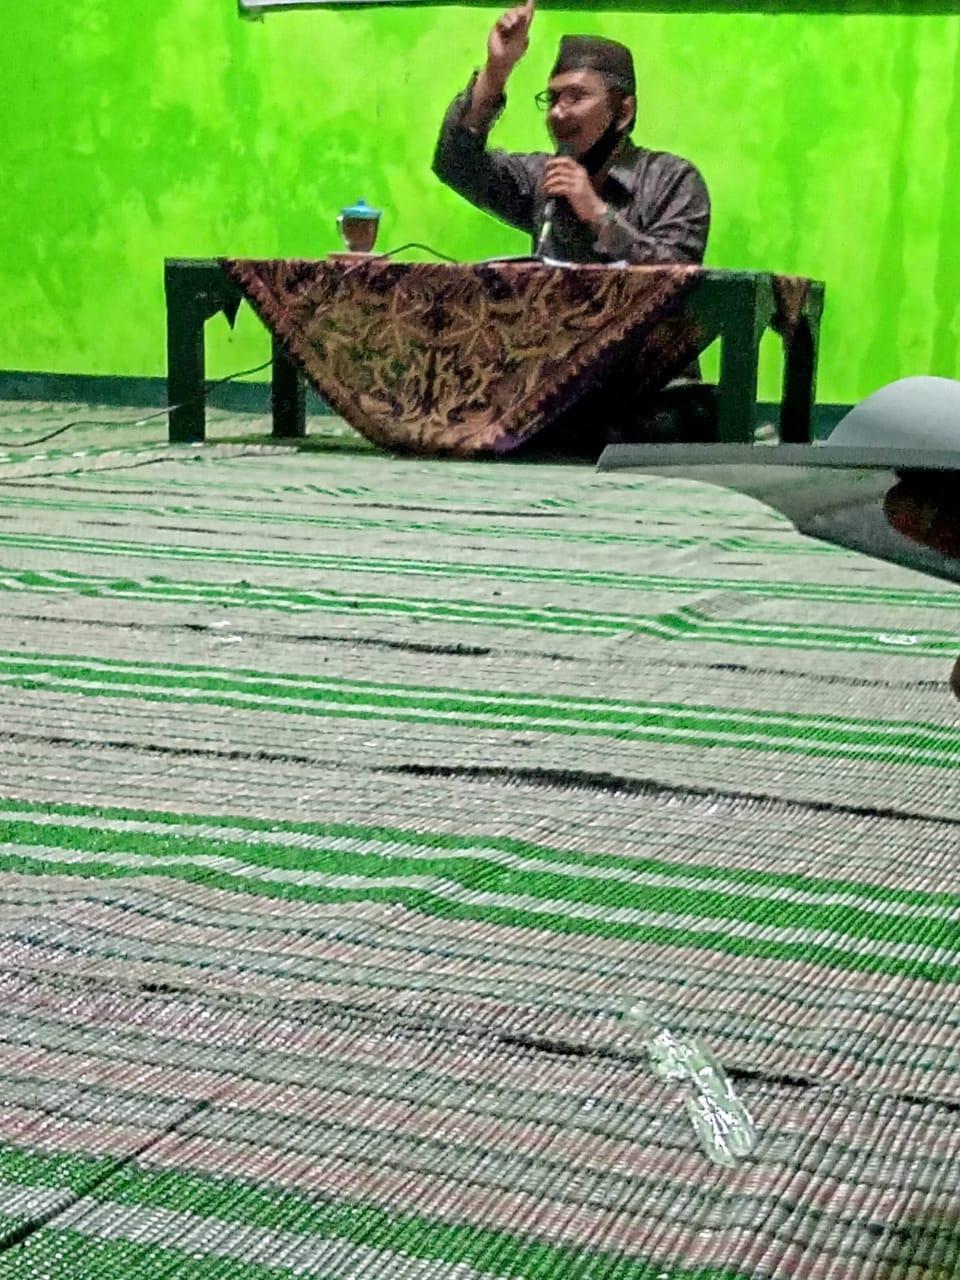 Kyai Imam Syafi'i, Rais MWC NU Pulung, saat membacakan Kitab Qul hadzihi sabili, karya Al- Allamah Sayyid Muhammad bin Alawi al-Maliky Al Makky Al- Hasany